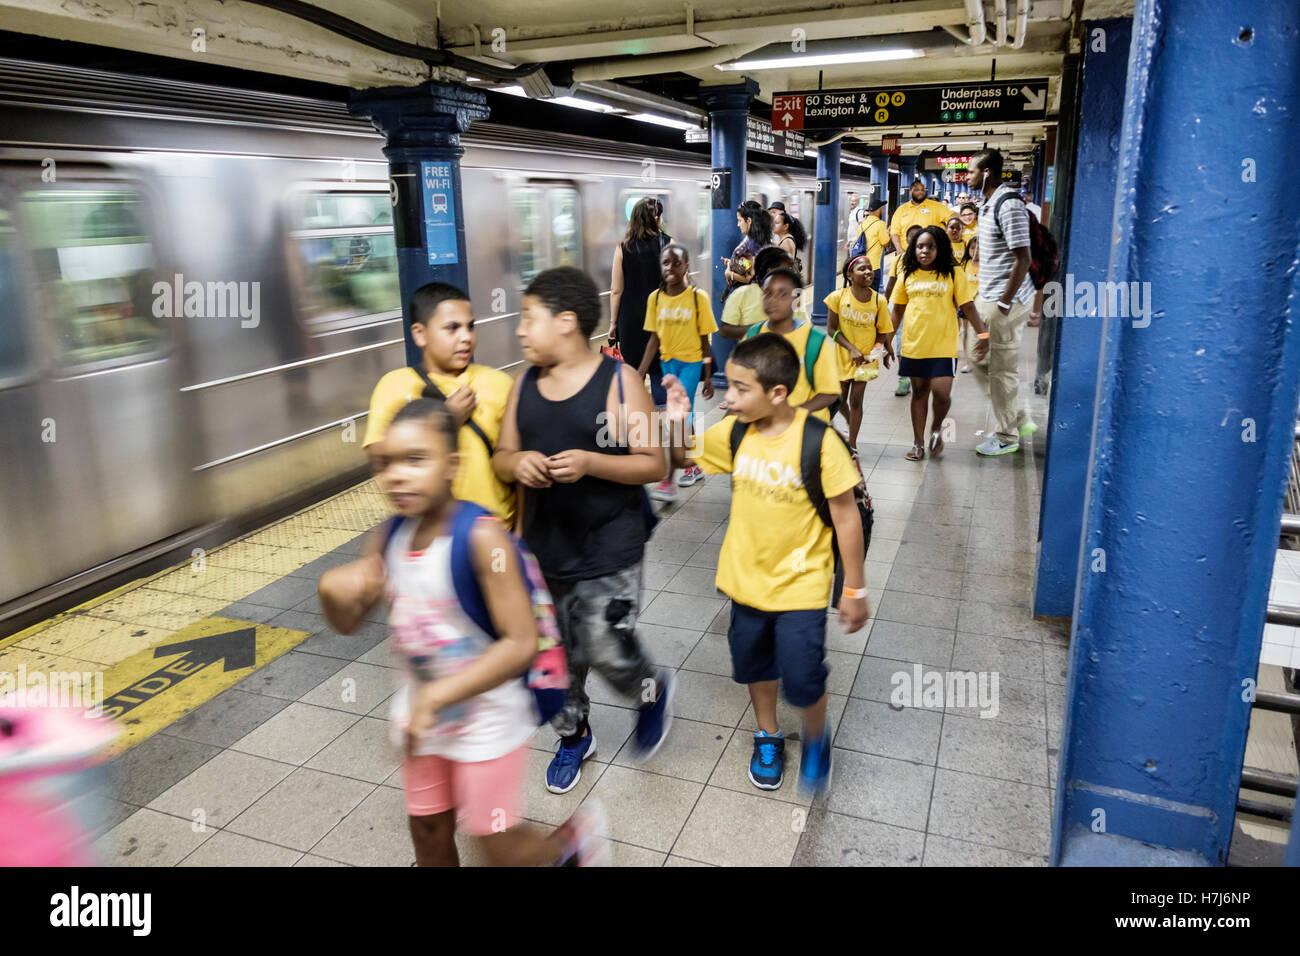 Manhattan New York City NYC NY Upper East Side subway MTA public transportation 59 Street Lexington Avenue station Stock Photo